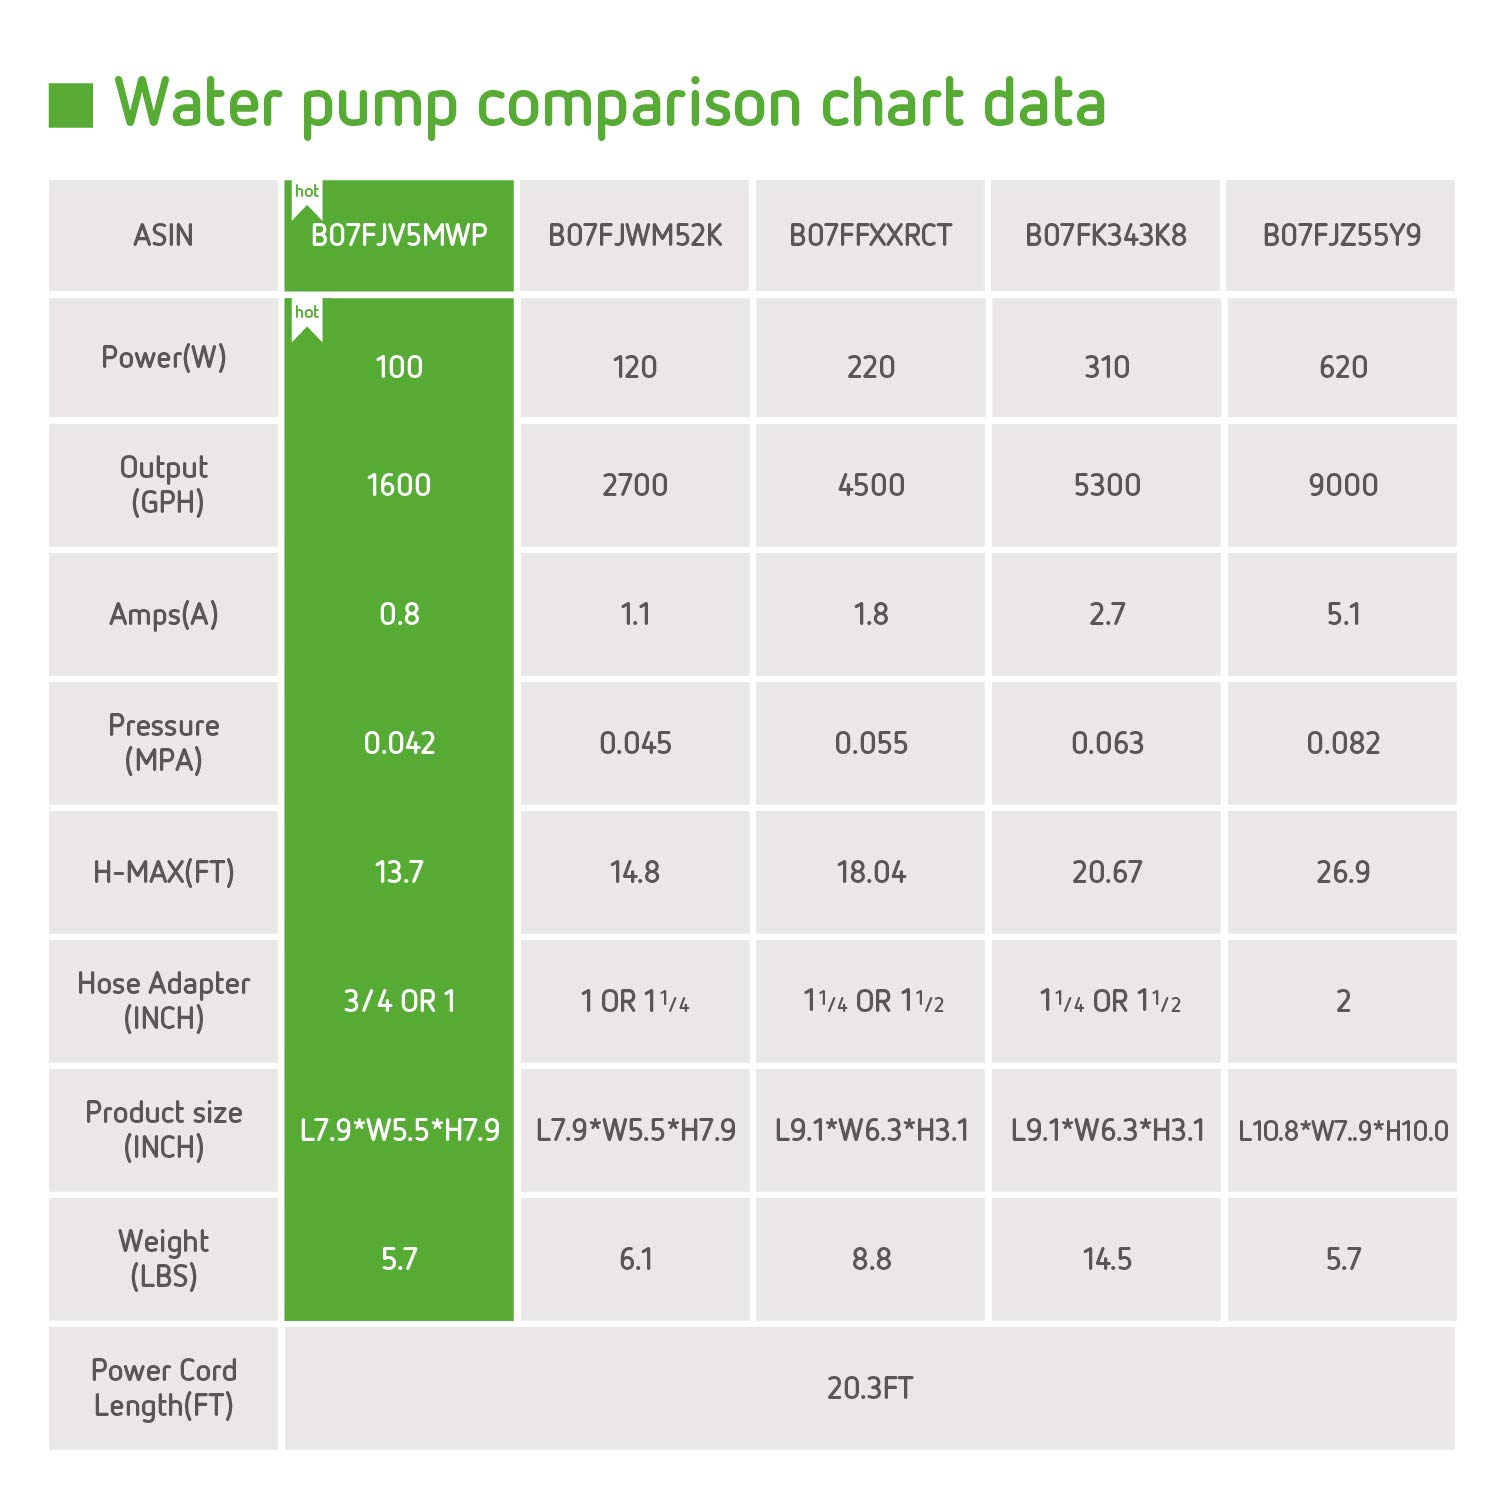 VIVOSUN 1600 GPH Submersible Water Pump Pond Pump 100W Ultra Quiet Aquarium Pump with 20.3ft Power Cord High Lift for Pond Waterfall Fish Tank Statuary Hydroponic